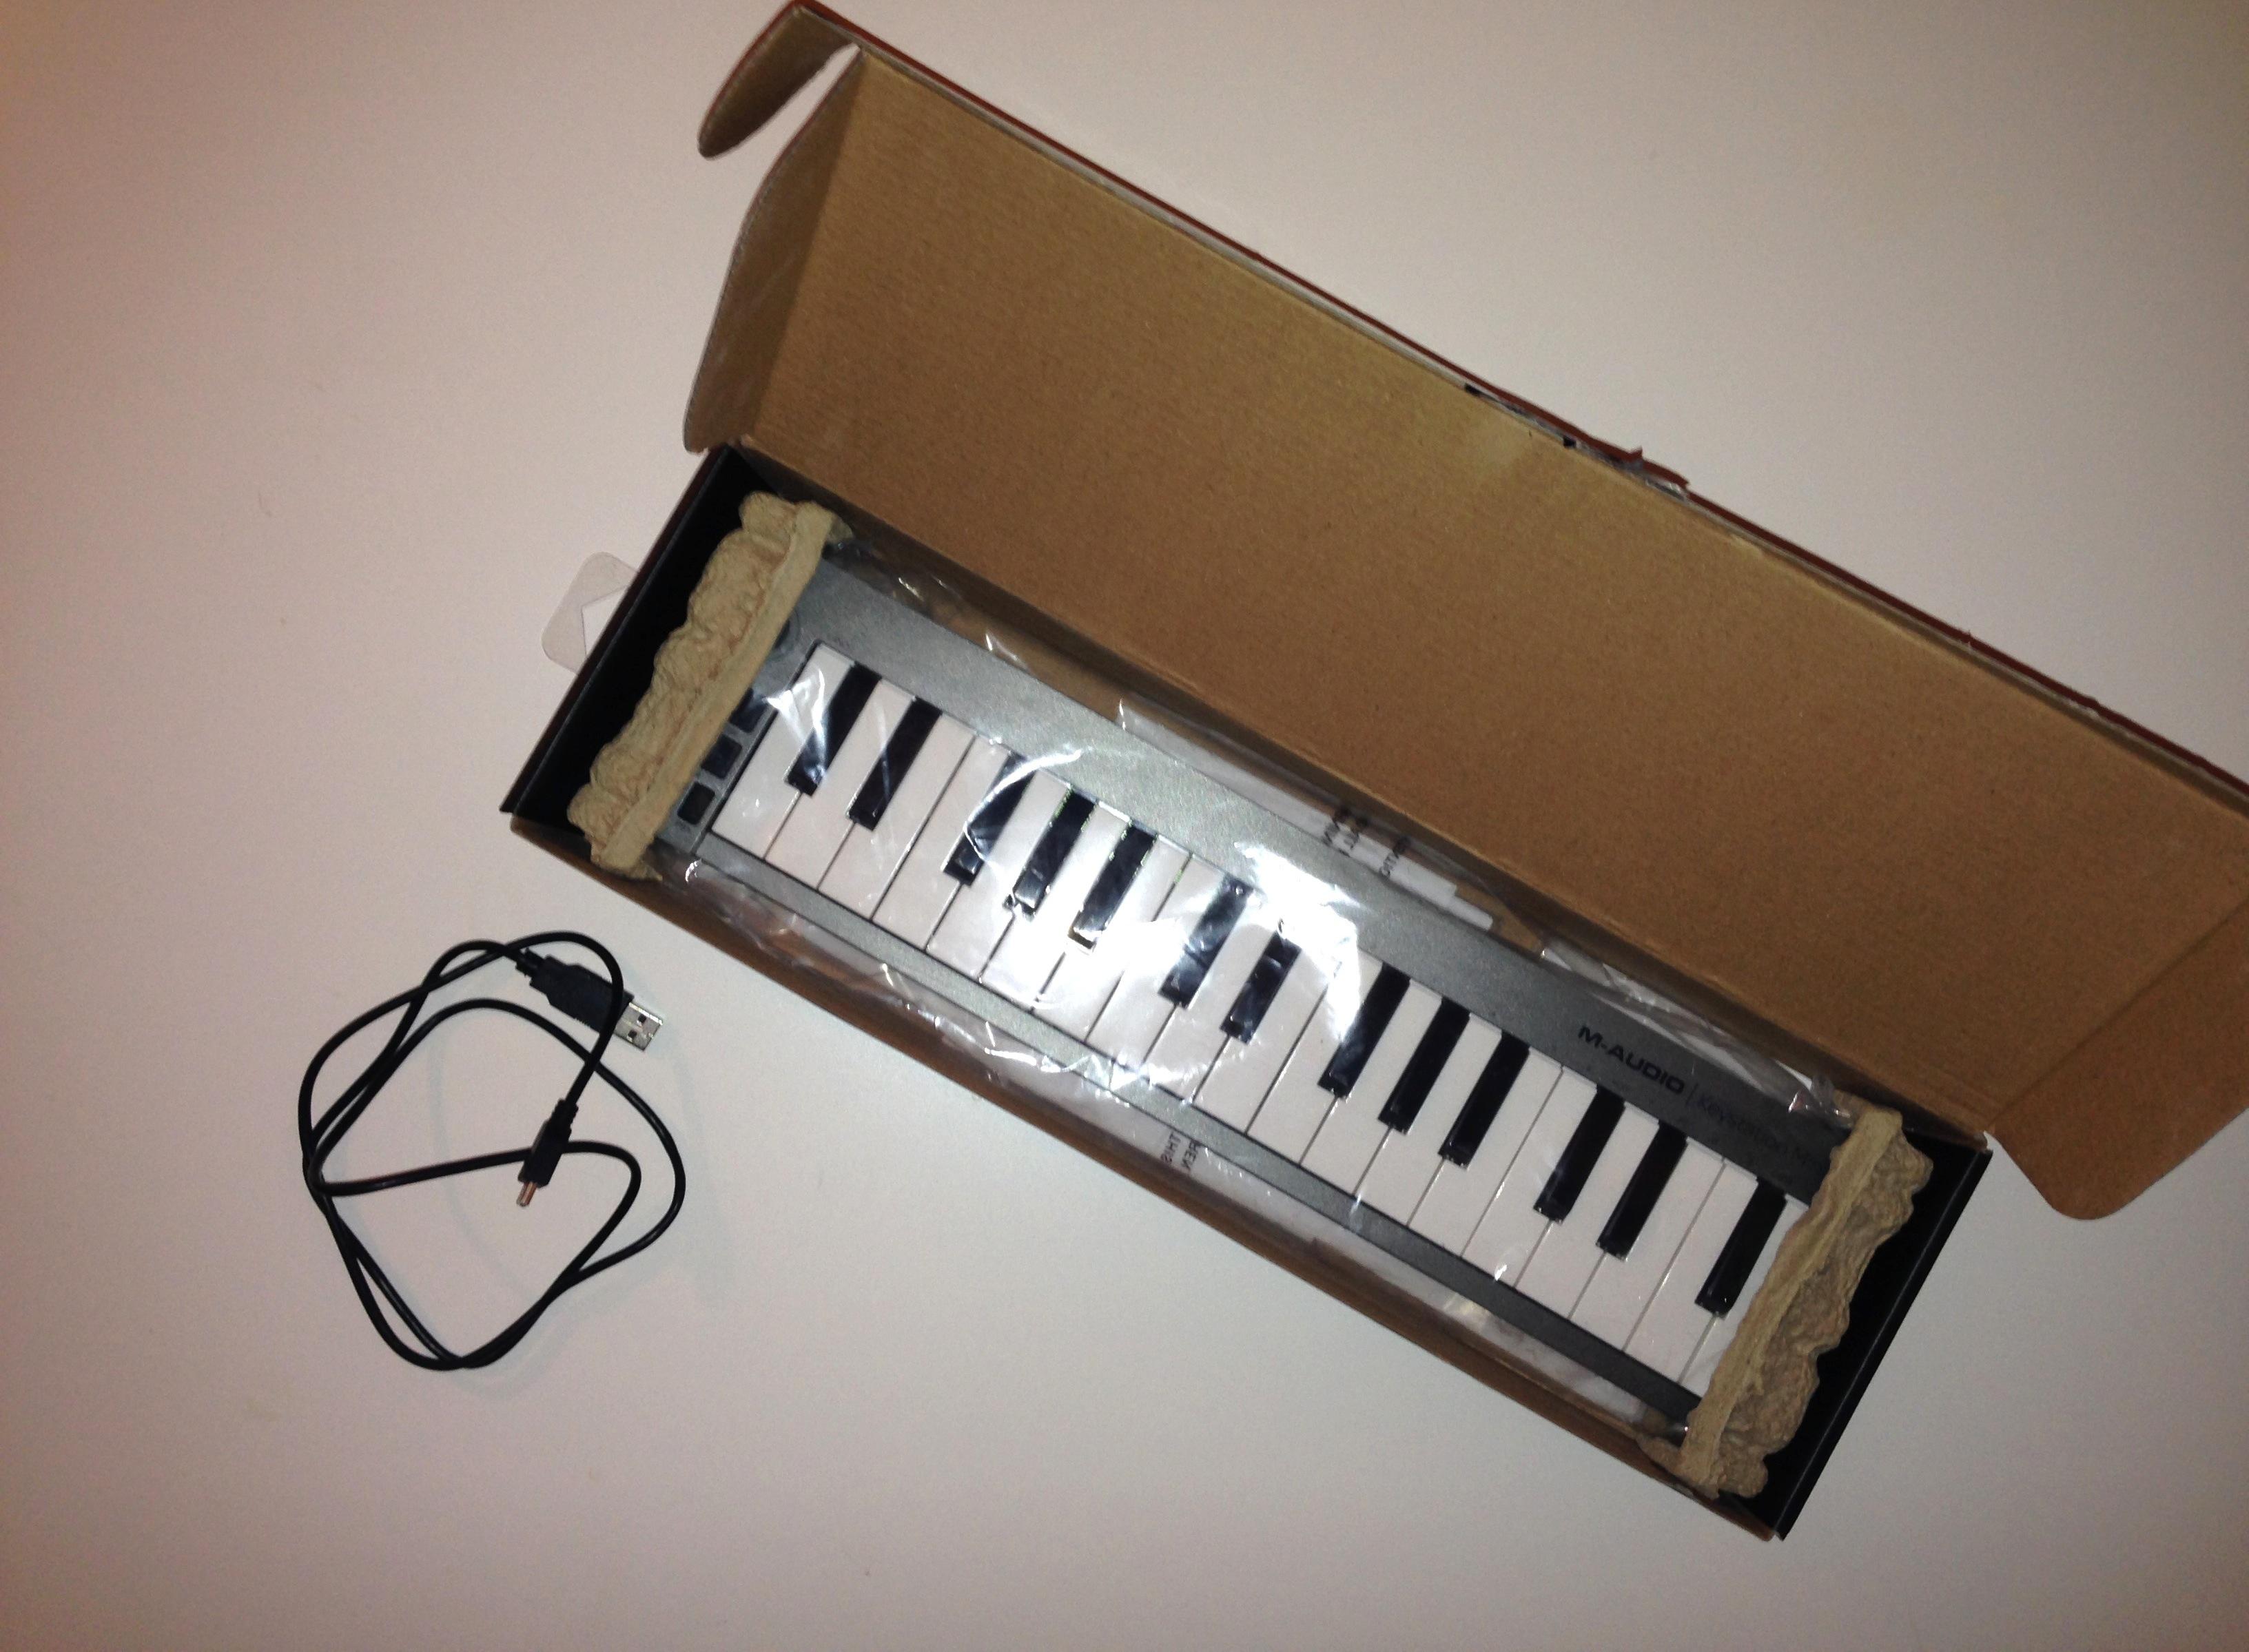 clavier m audio keystation mini 32 ile de france. Black Bedroom Furniture Sets. Home Design Ideas